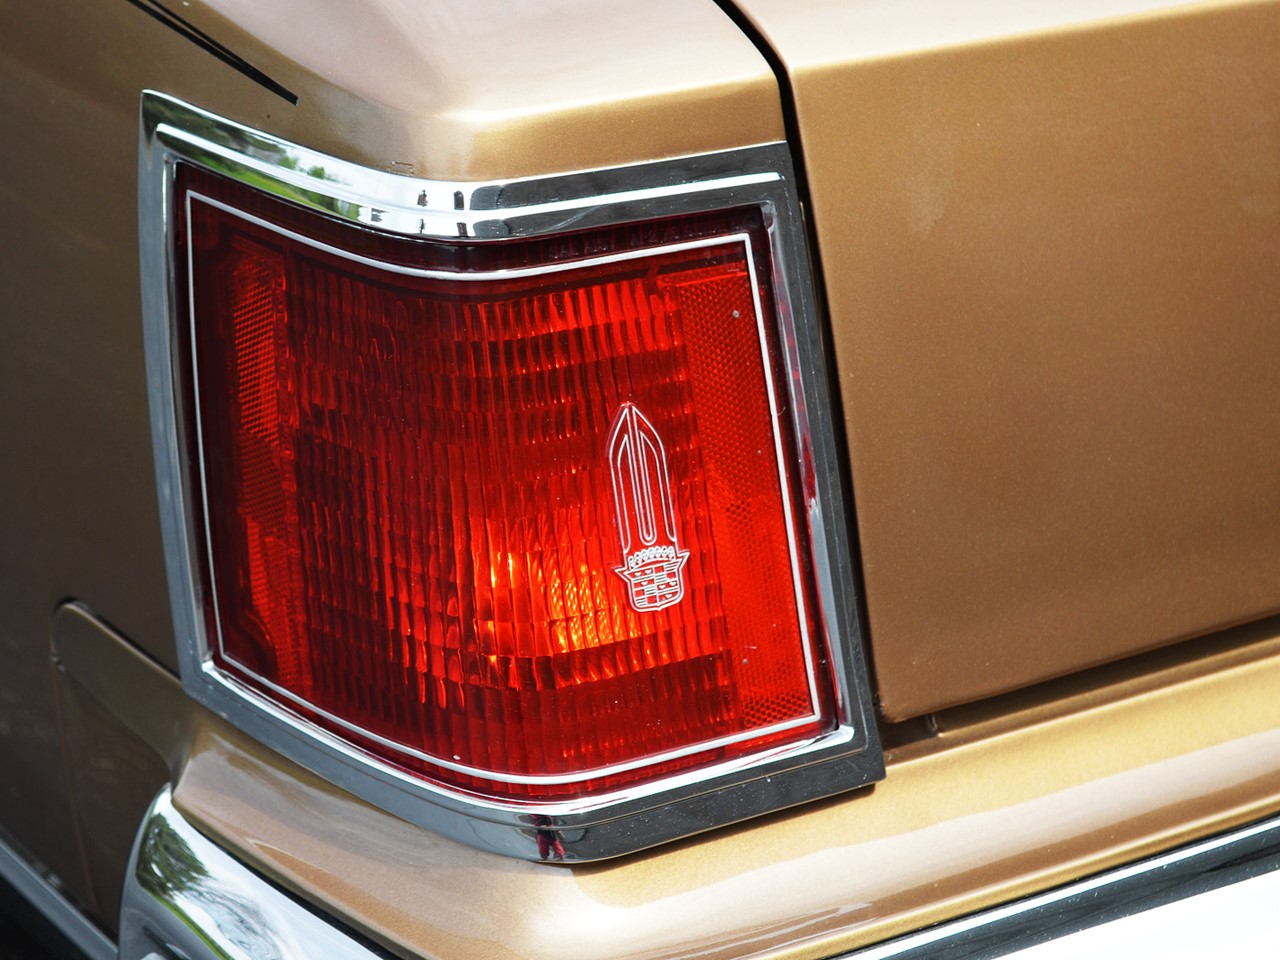 1976 Cadillac Seville 10